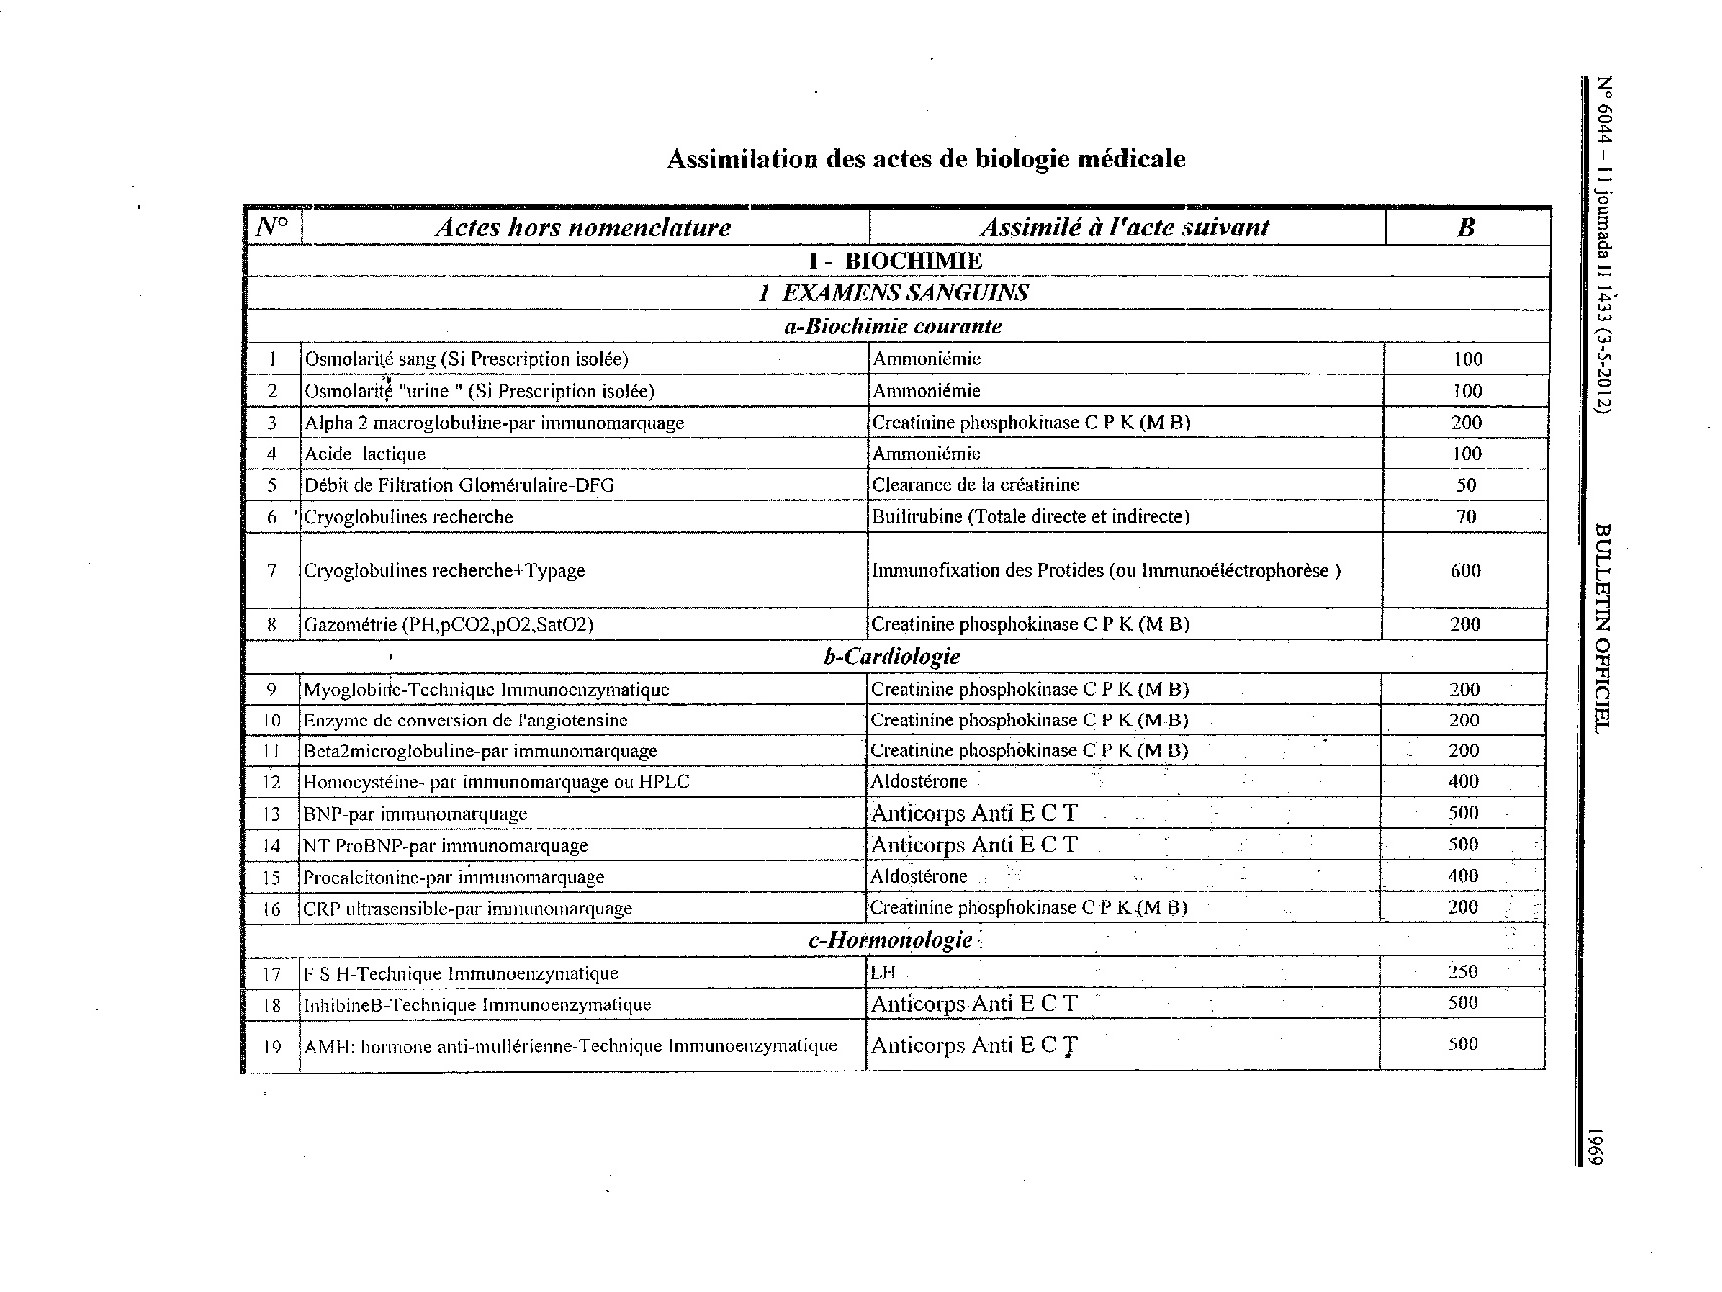 Assimilation-actes-de-biologie-medicale-002